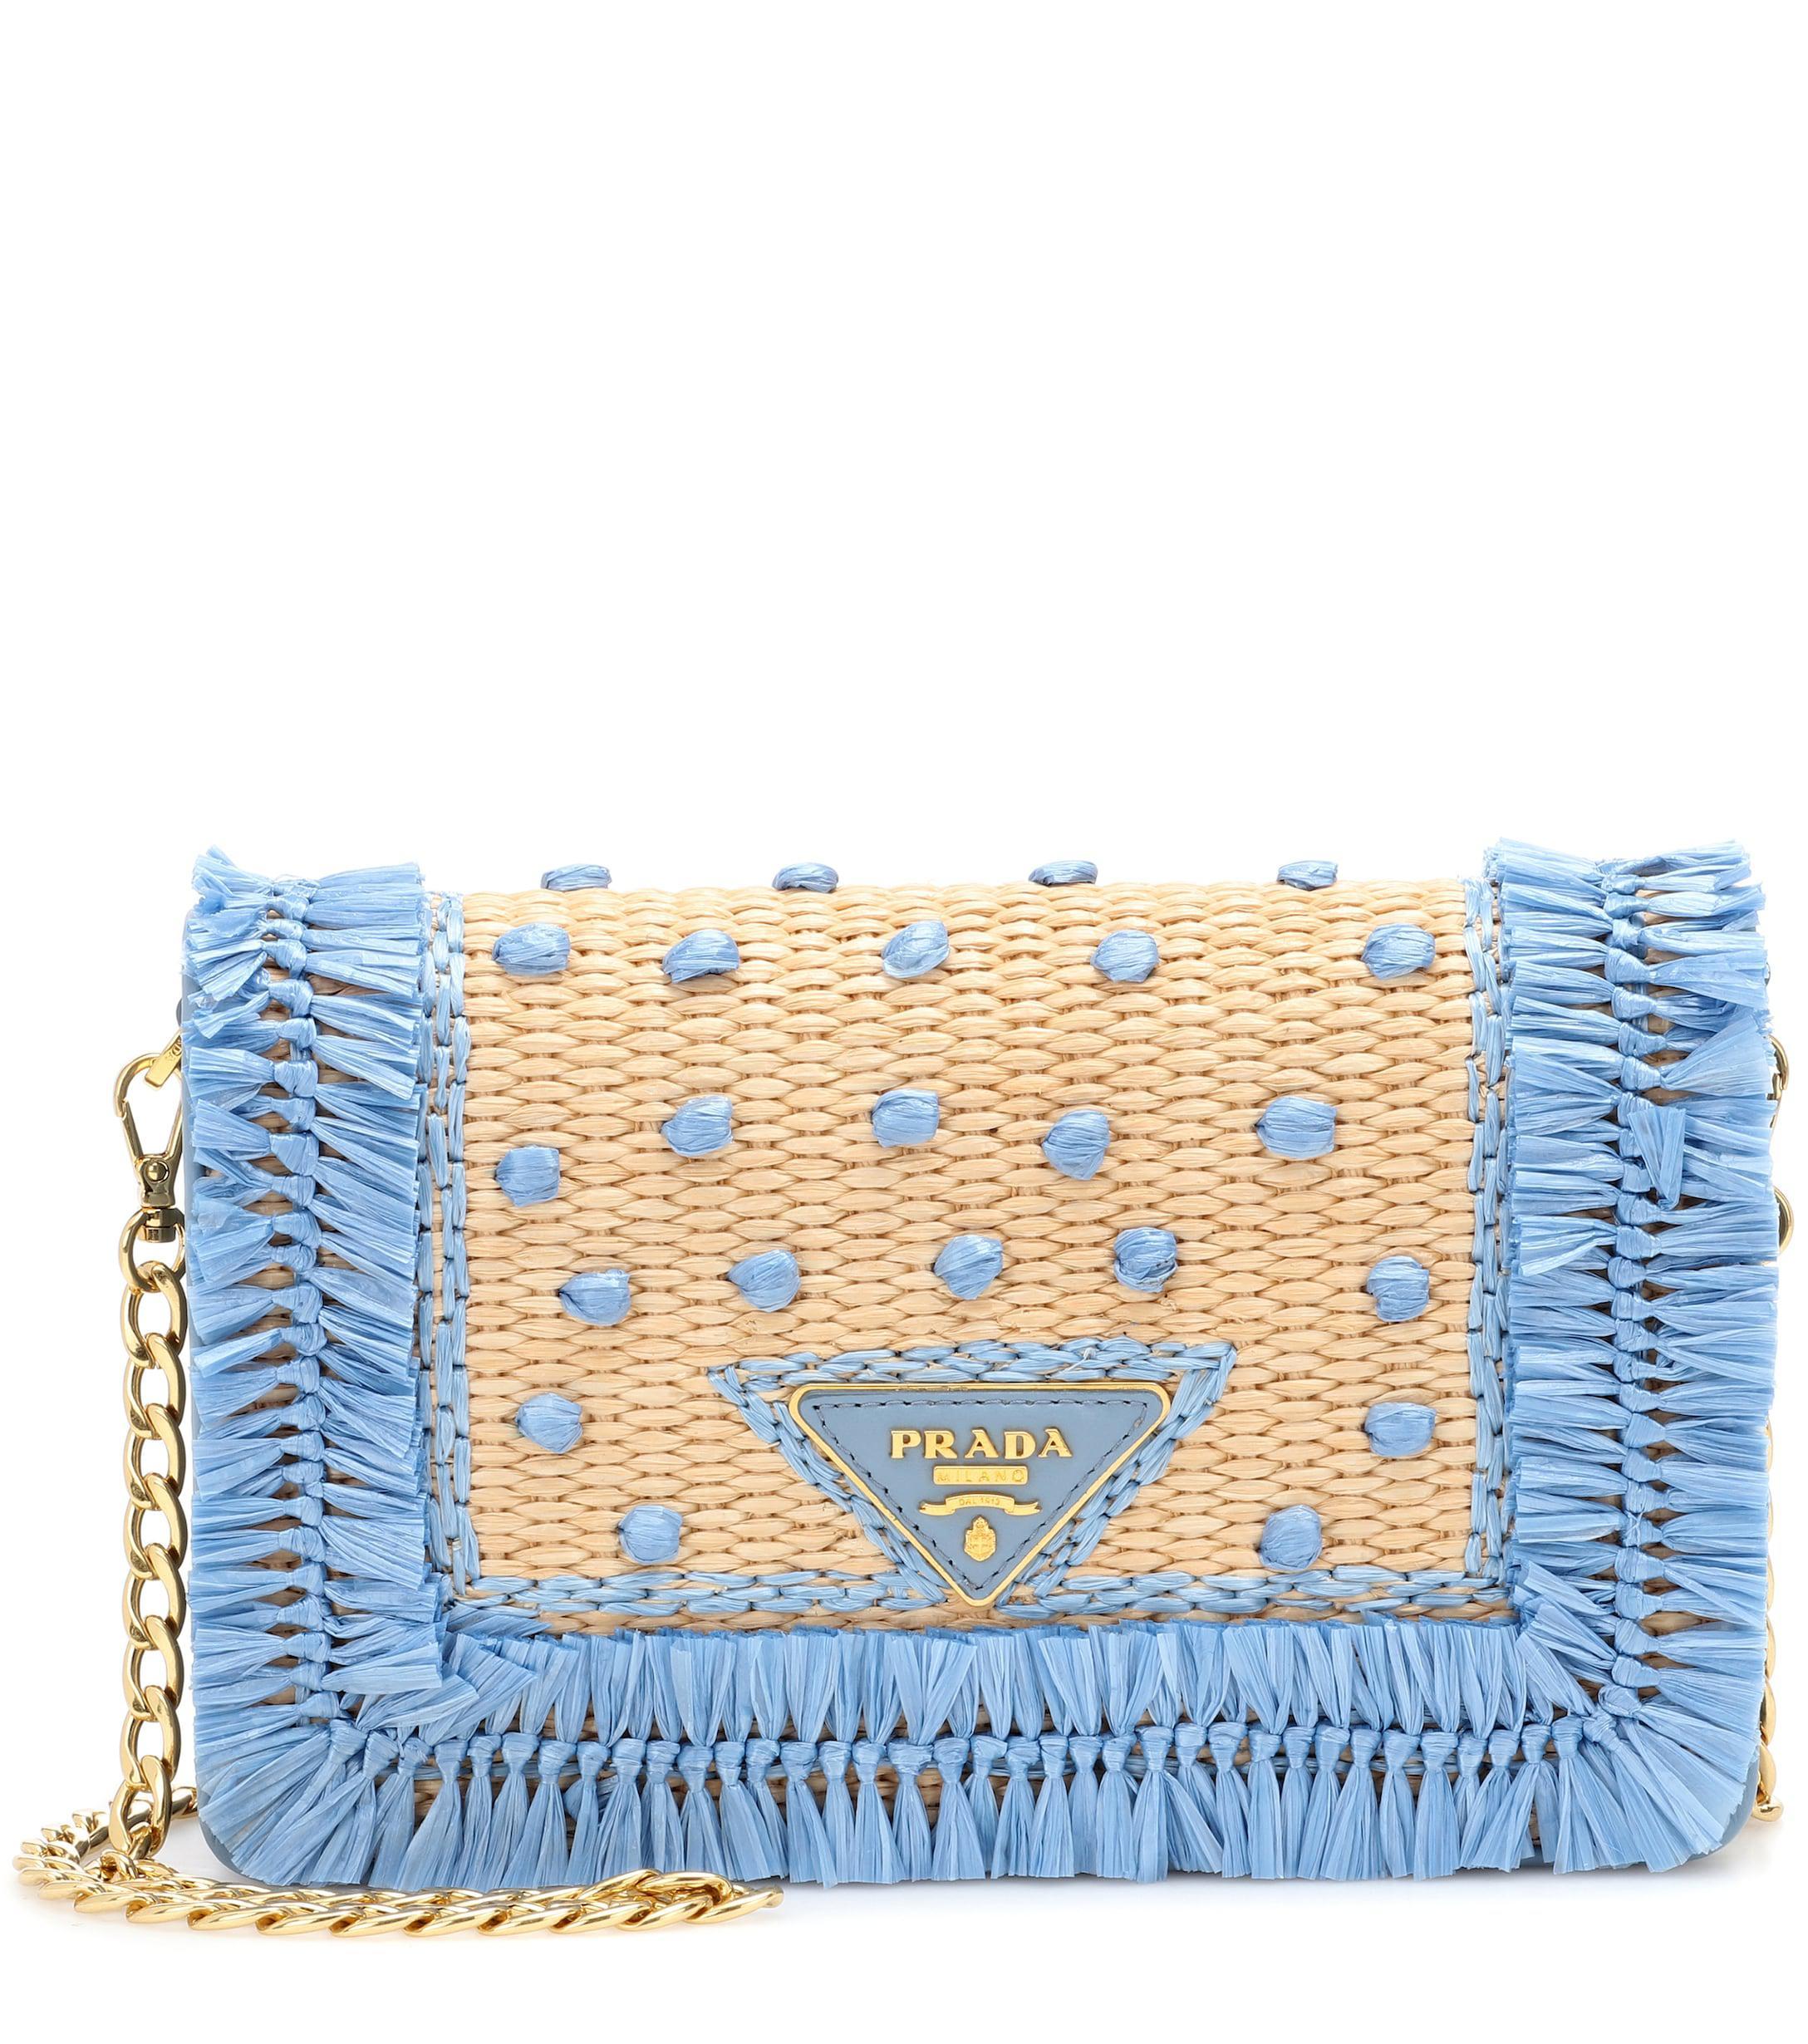 Prada - Blue Leather And Raffia Shoulder Bag - Lyst. View fullscreen 2cf5f96326